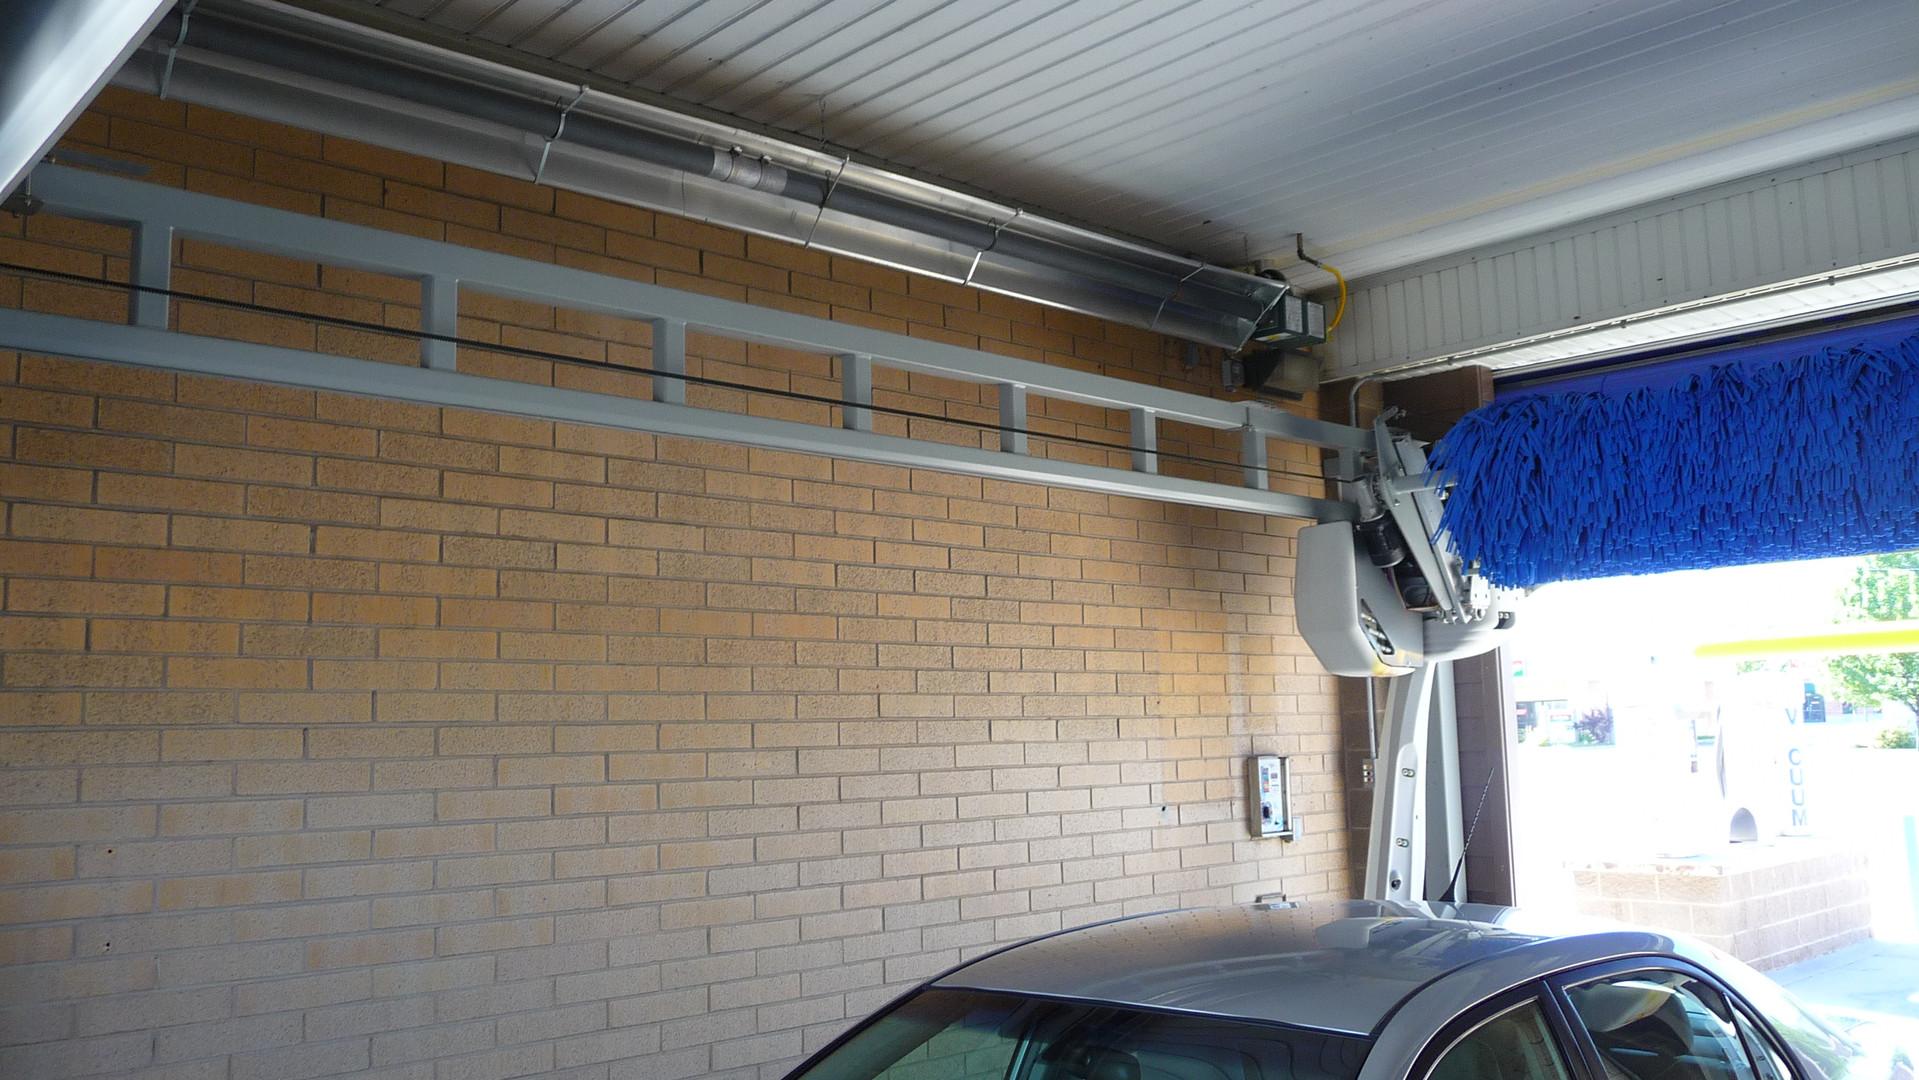 UXR Series Tube Heater In Wash Bay